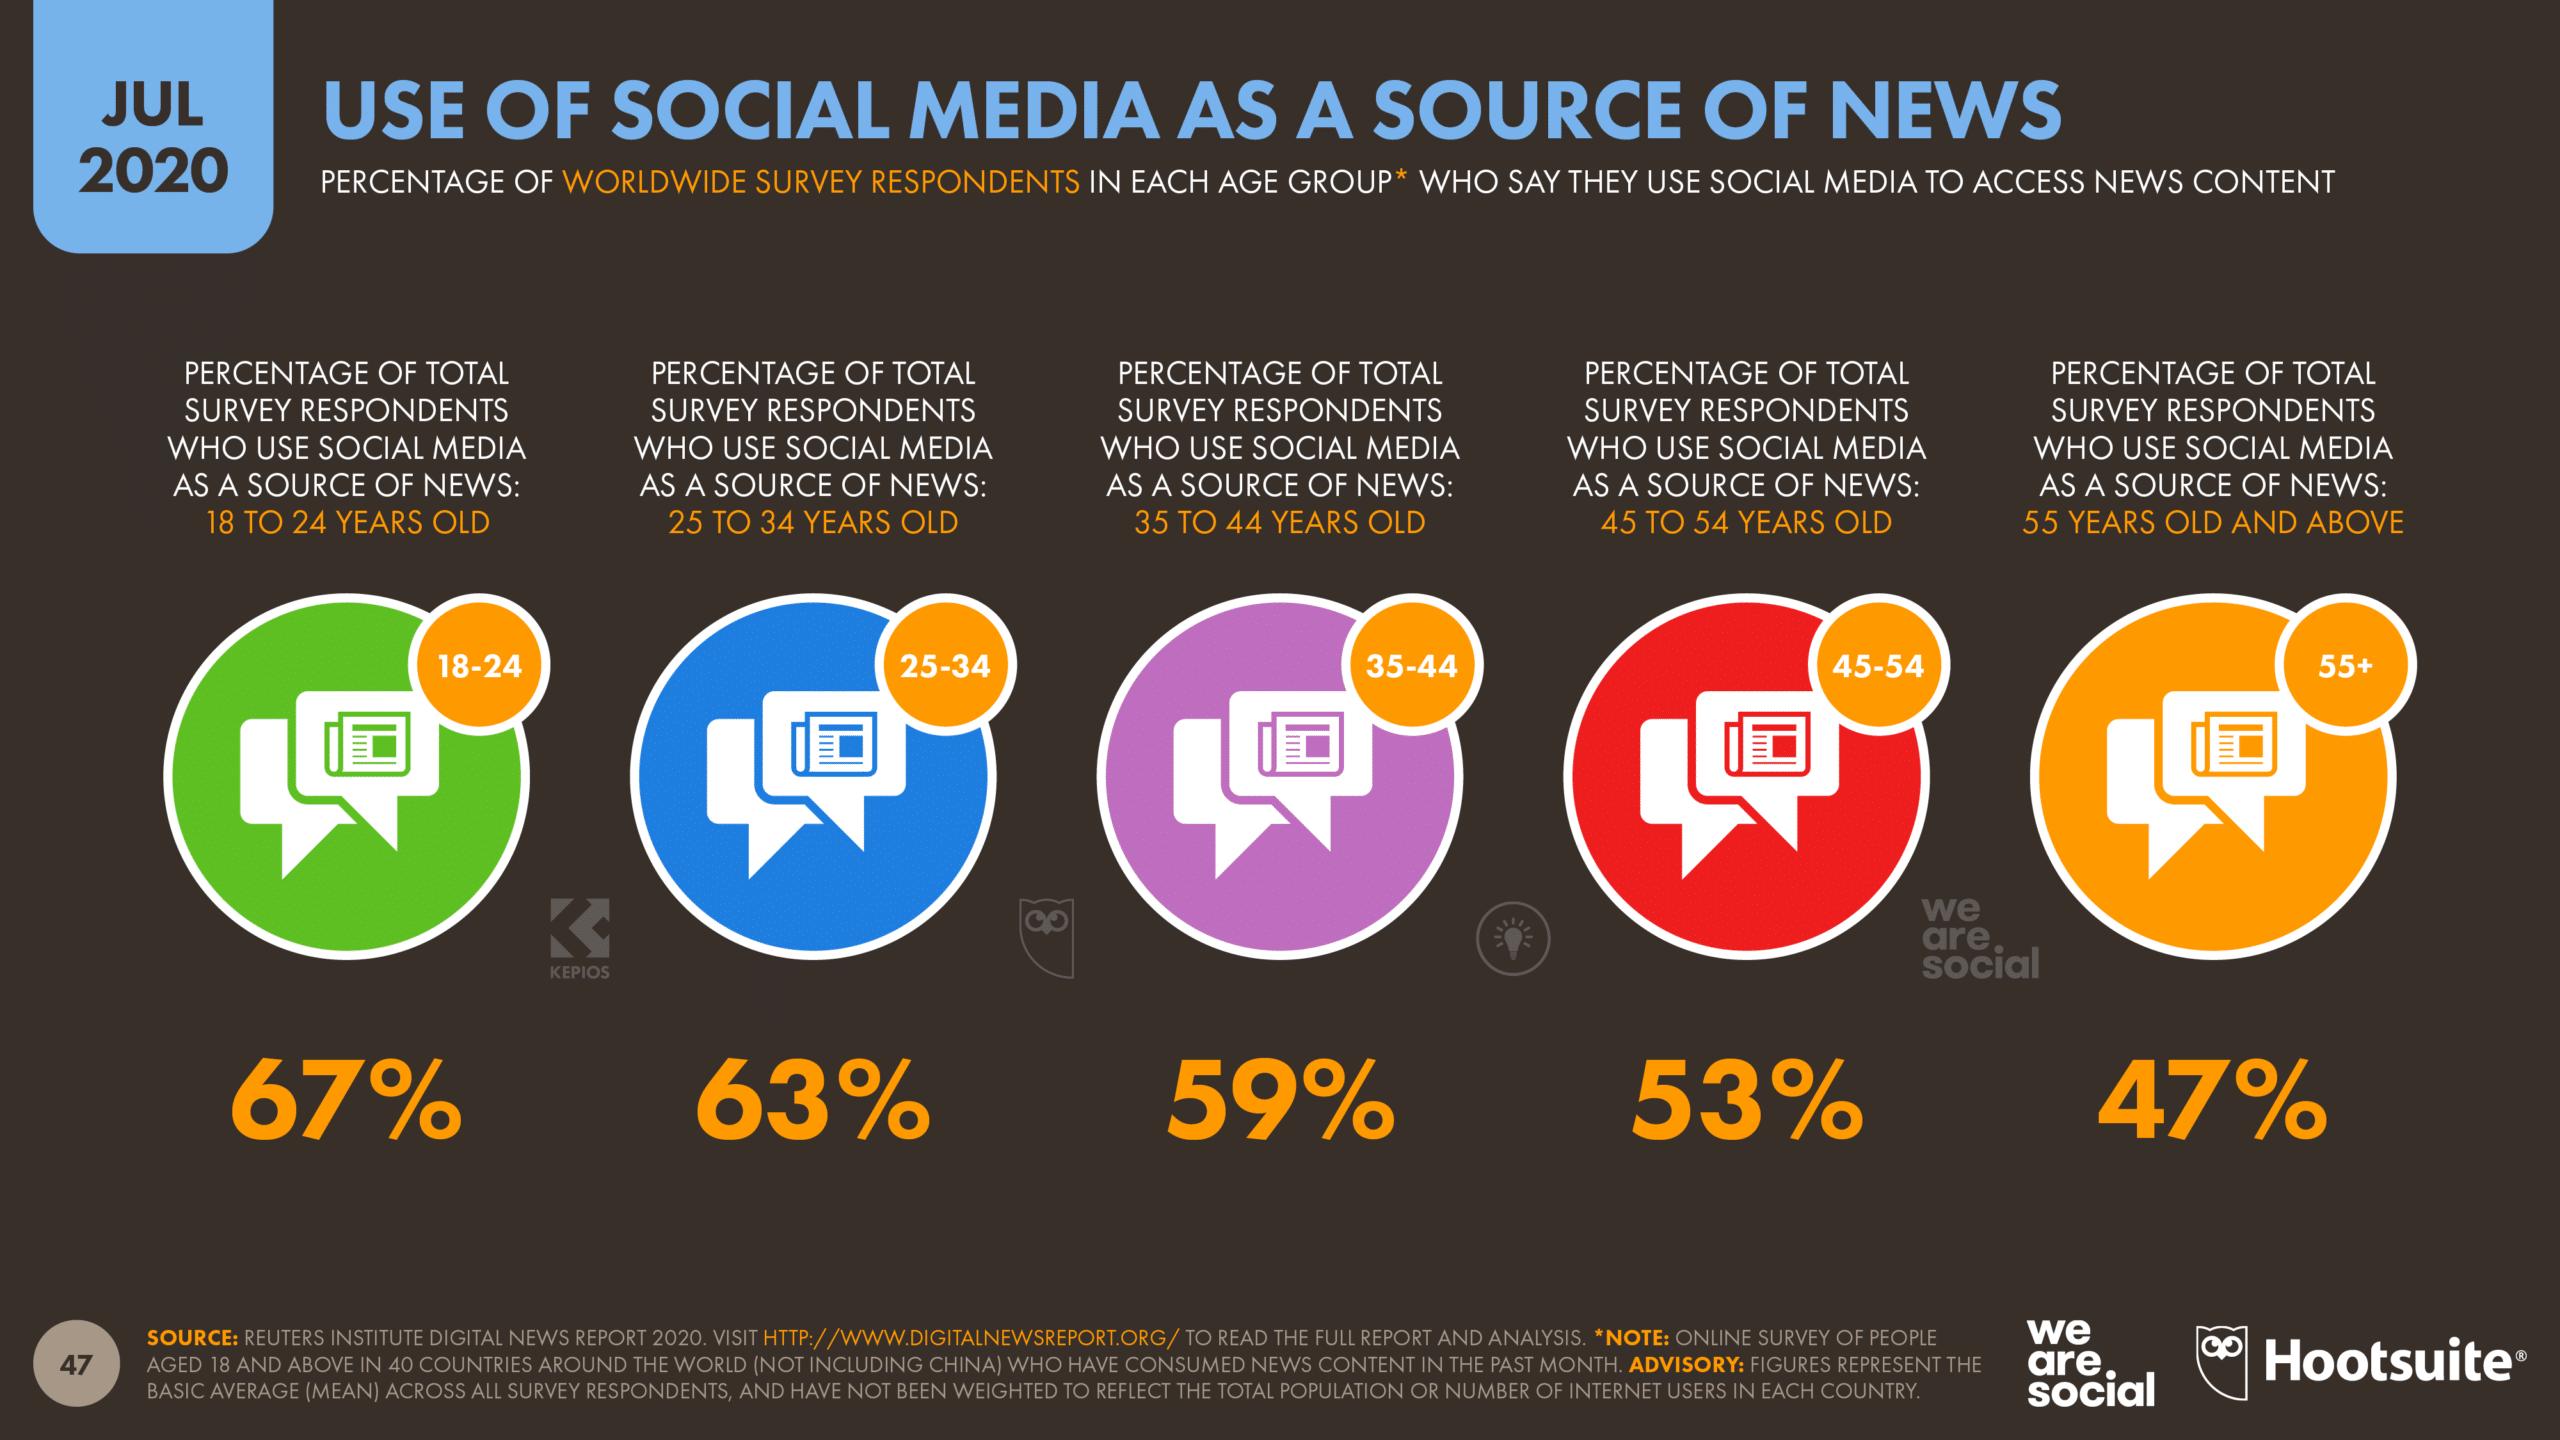 Use of social platforms as news